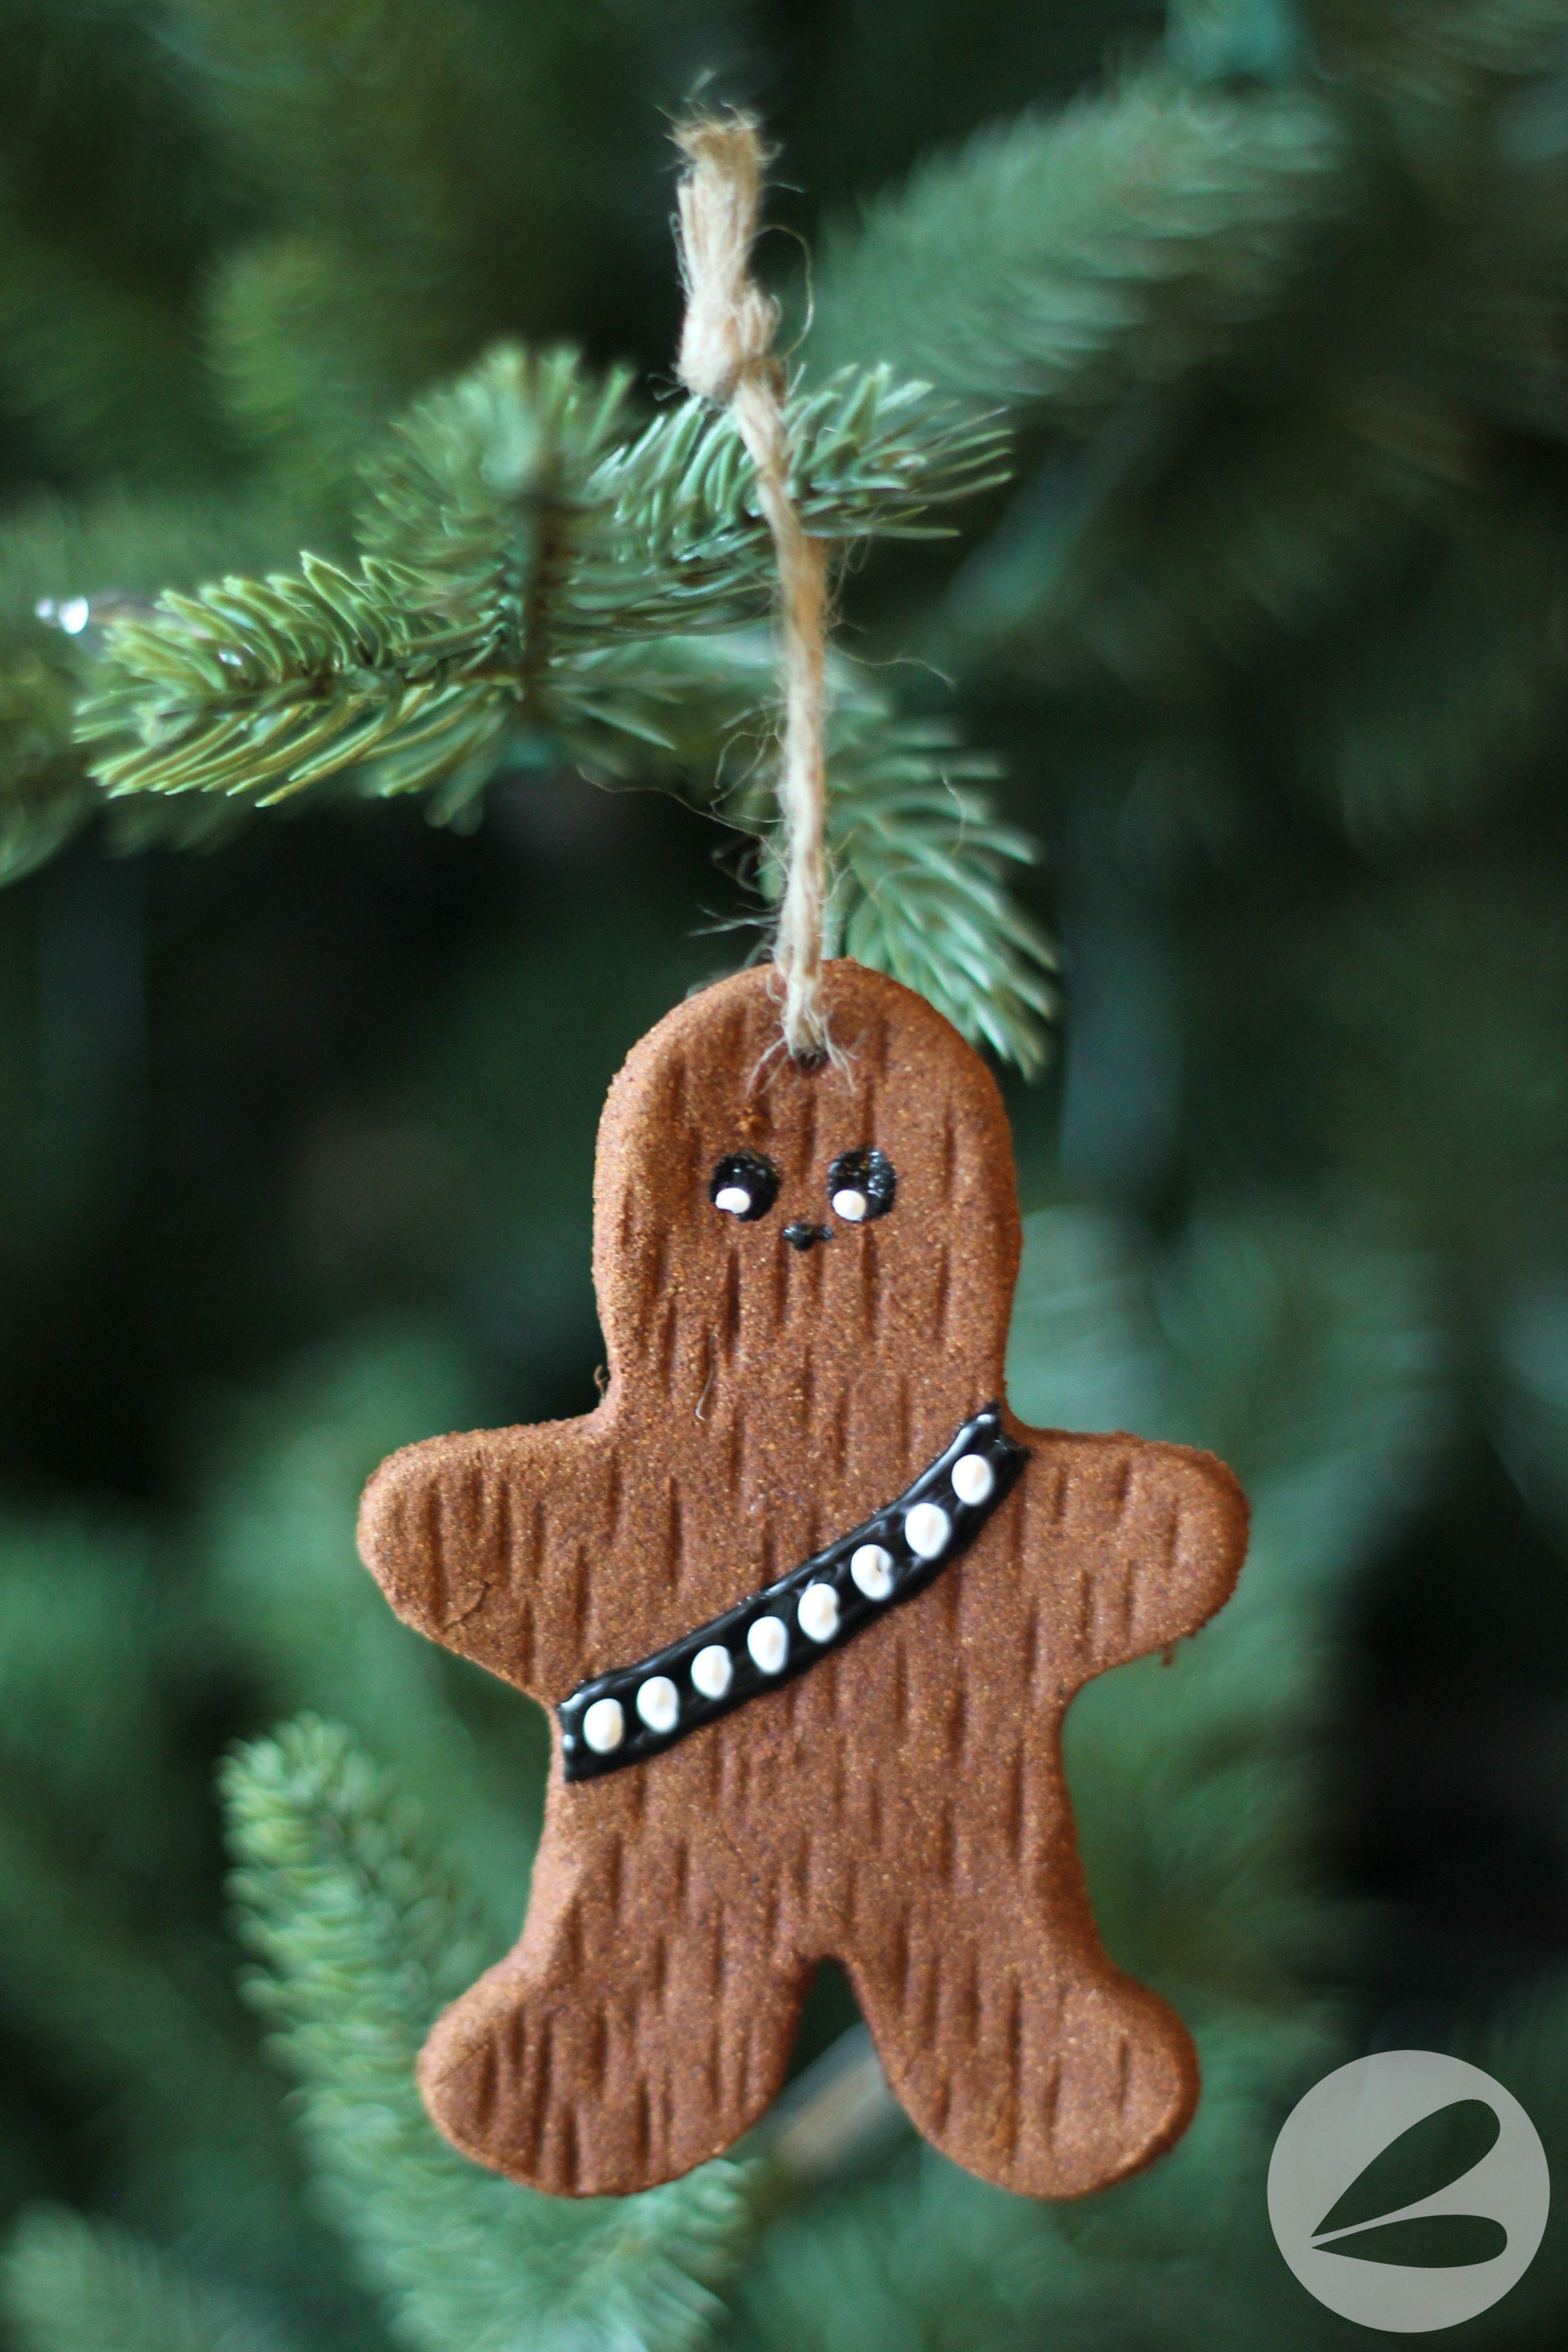 cinnamon chewbacca ornament - Chewbacca Christmas Ornament